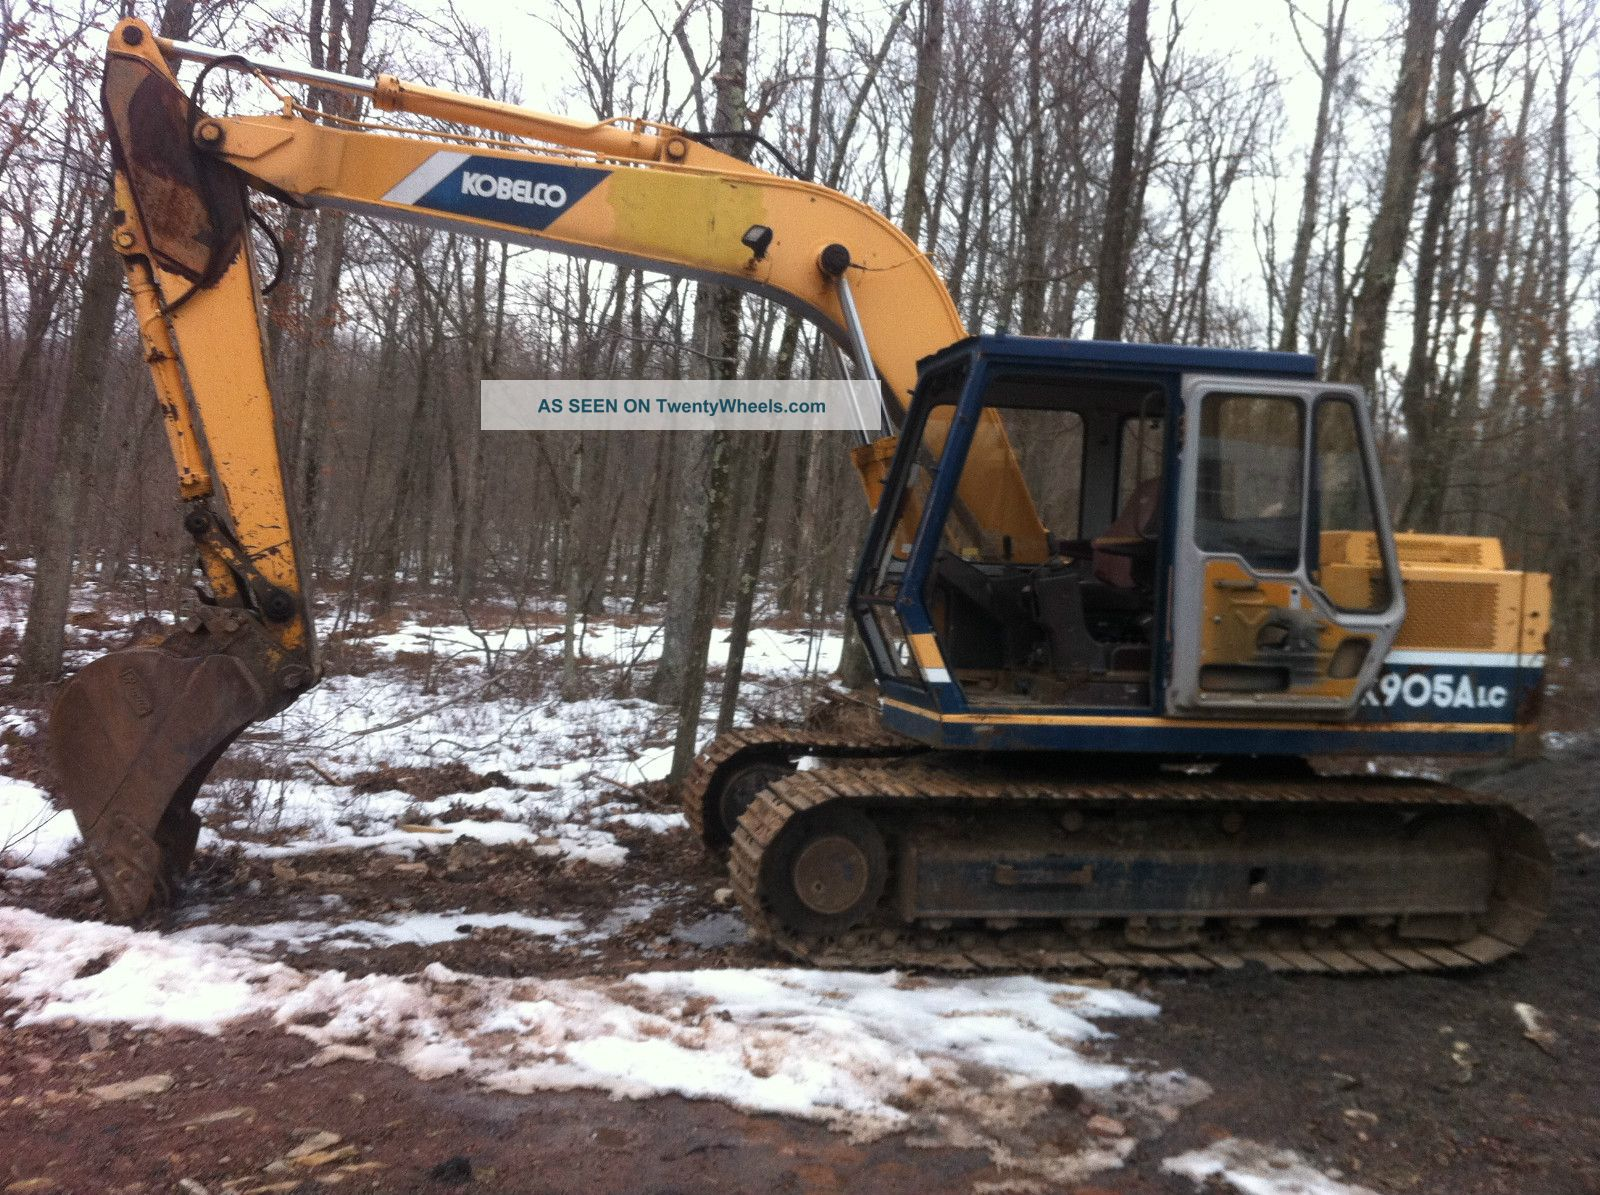 Kobelco K 905a Lc Excavator Shovel Diesel Backhoe